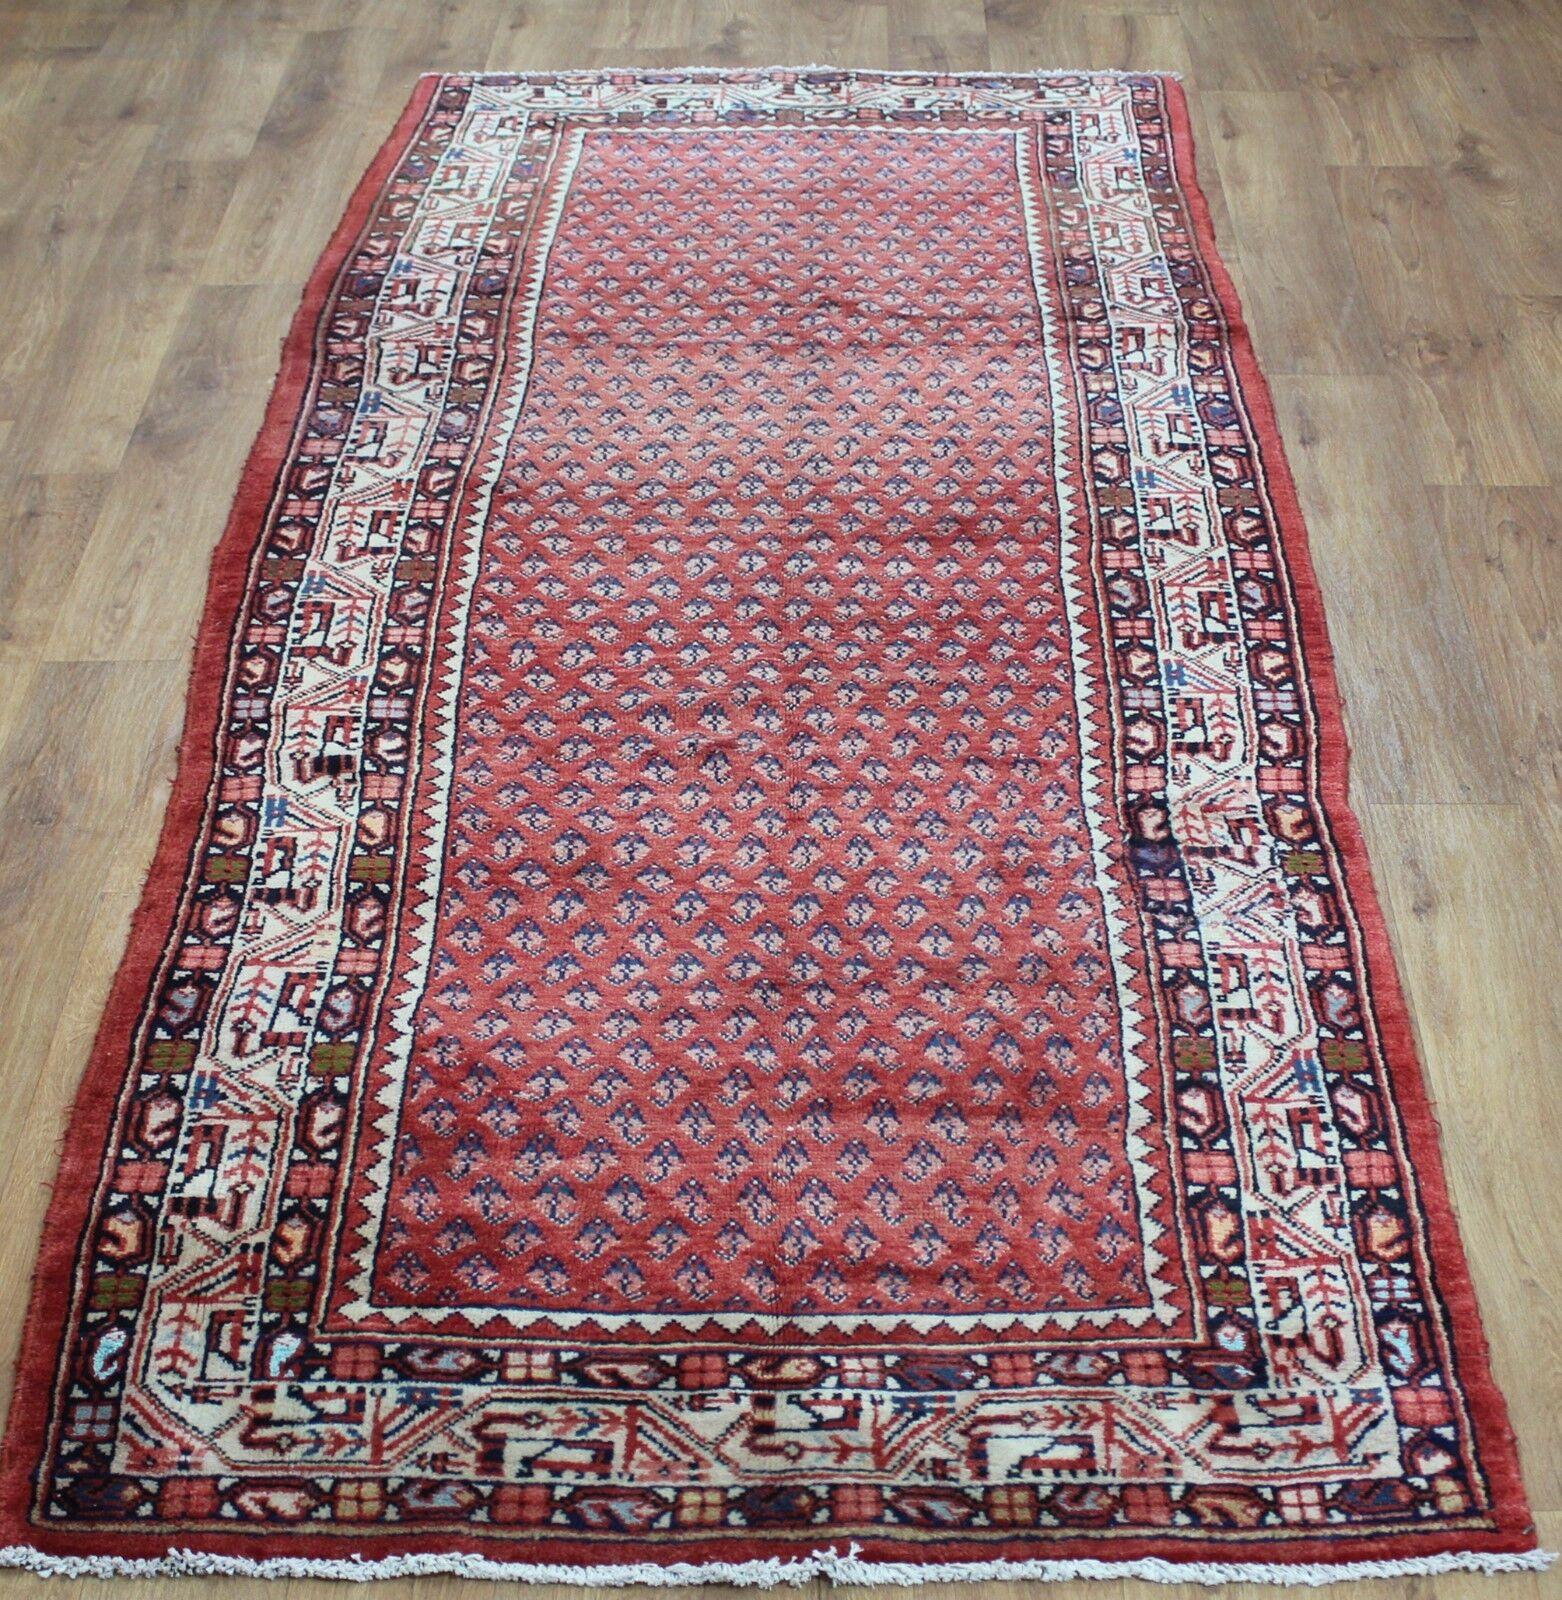 Traditional Traditional Traditional Vintage Wool Handmade Classic Oriental Area Rug Carpet 315cmX110cm 960c42